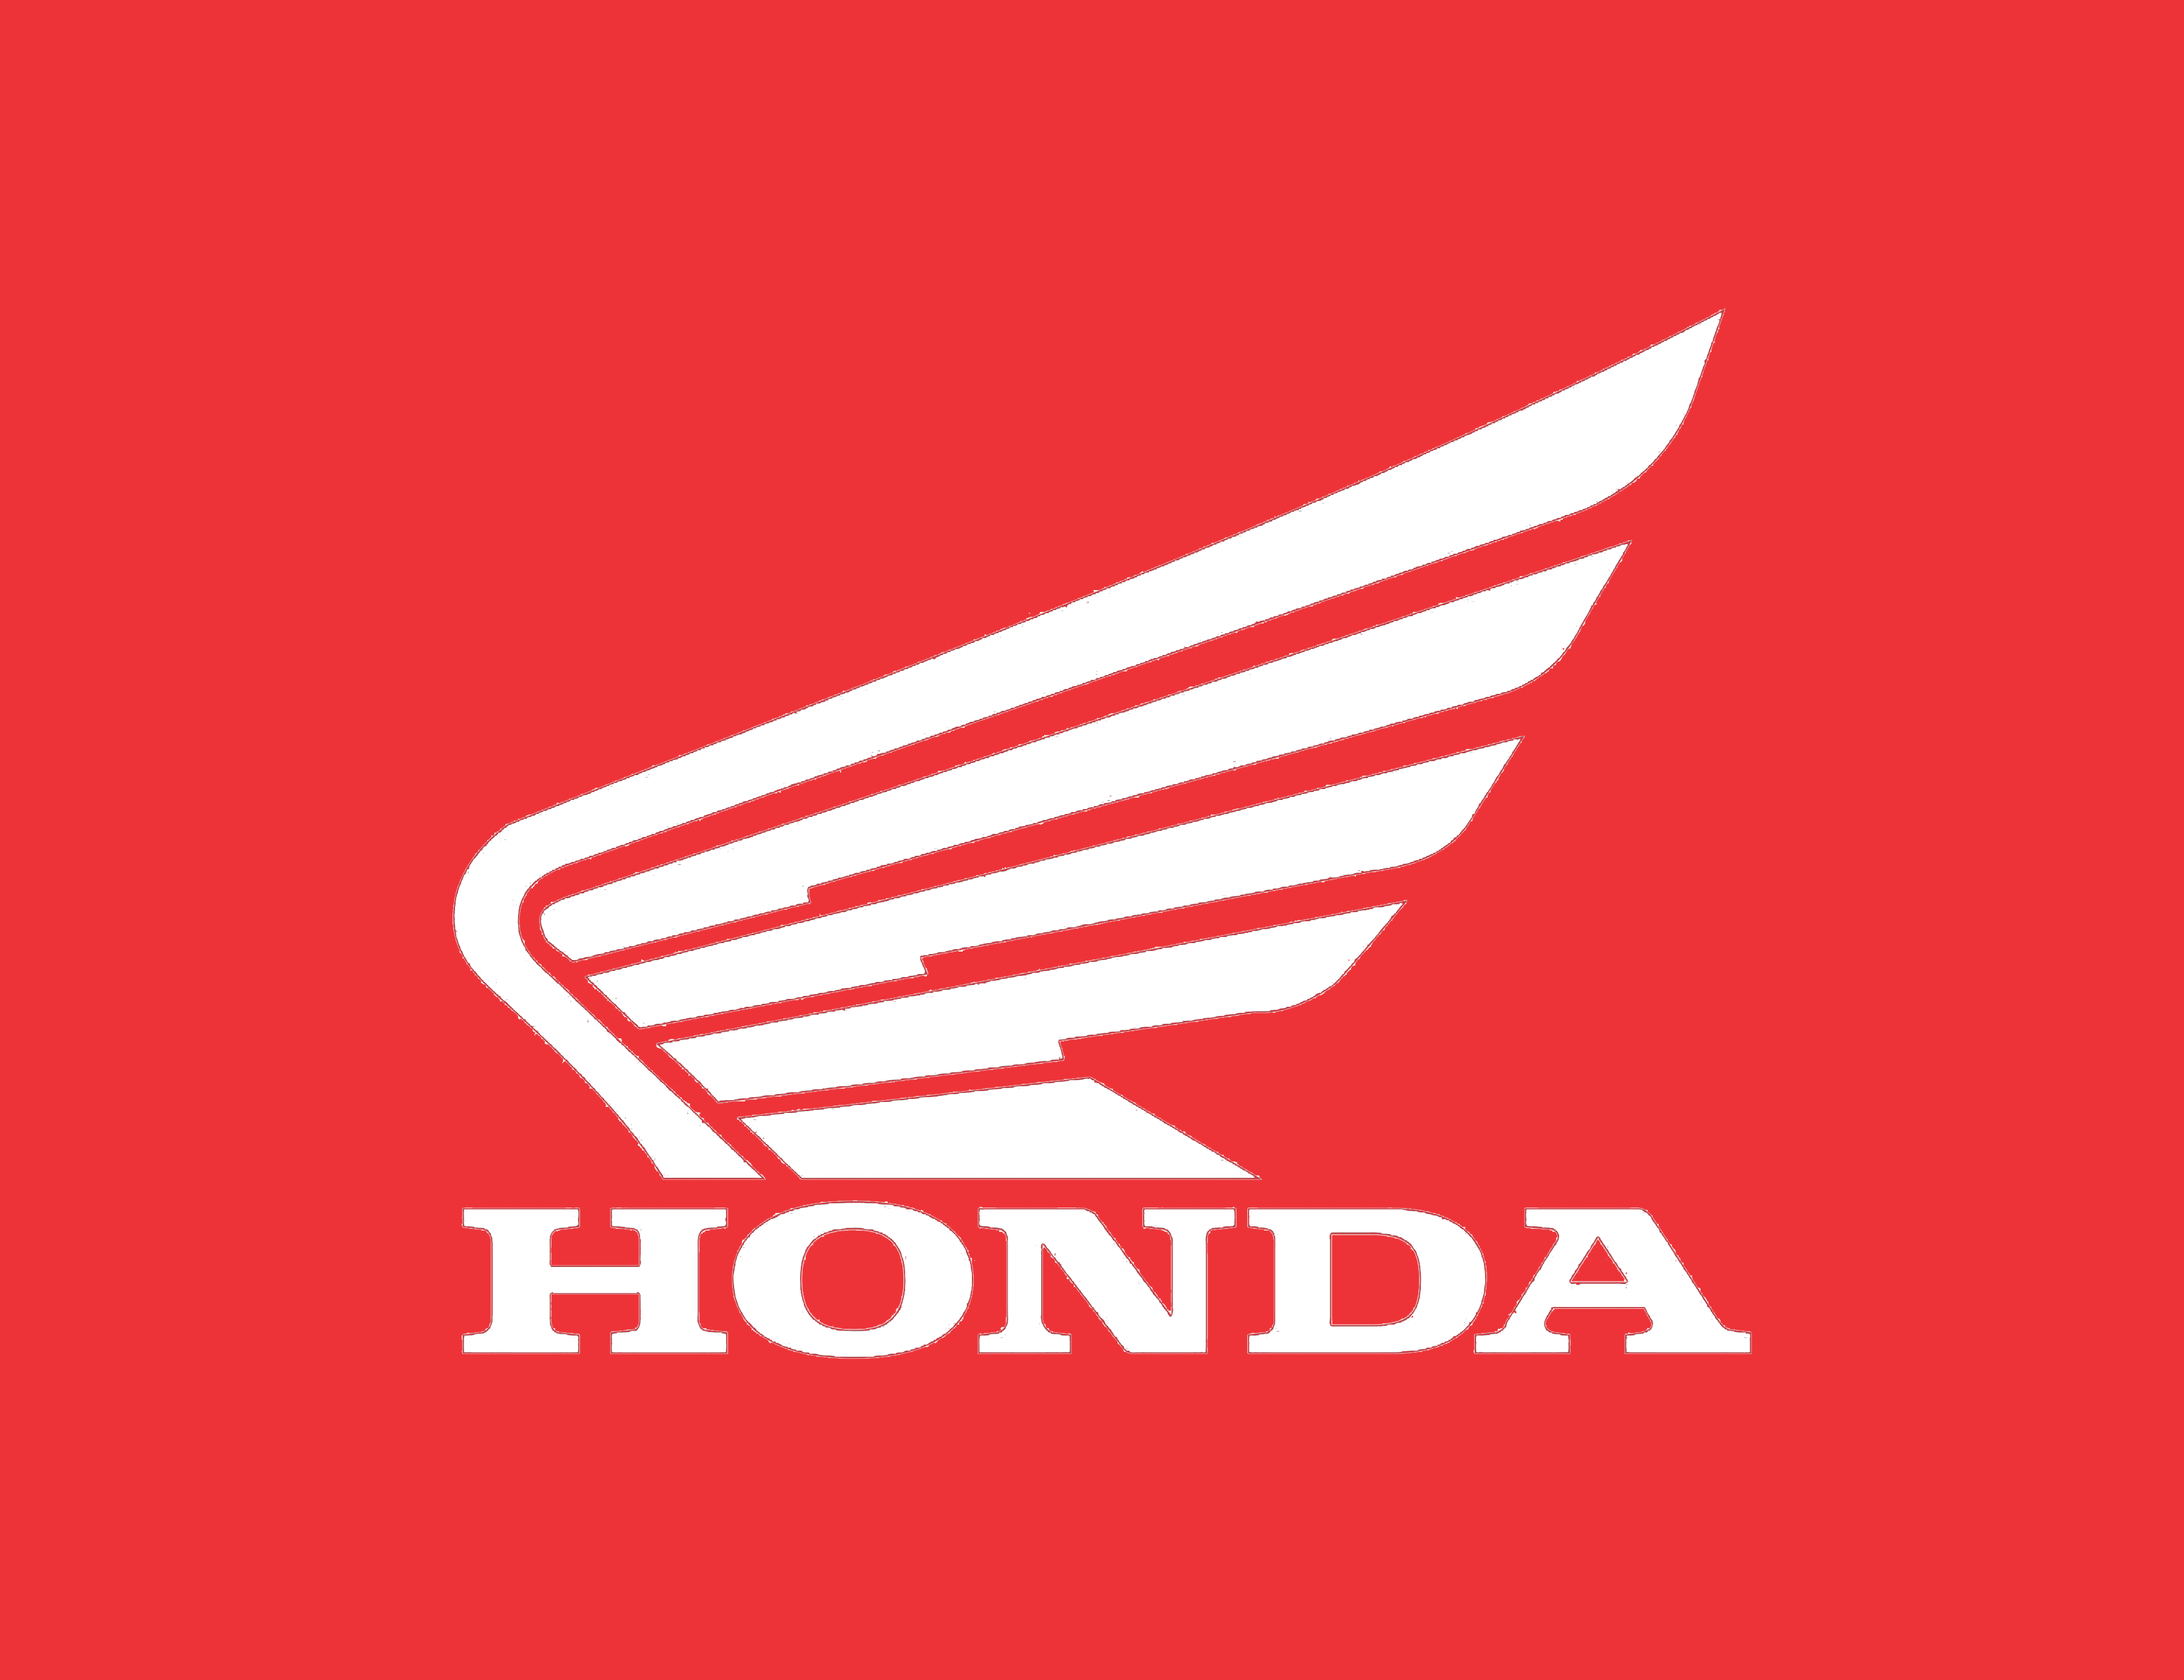 honda motorcycle logo logojoy rh logojoy com honda motorcycles logo vector honda motorcycles logo vector